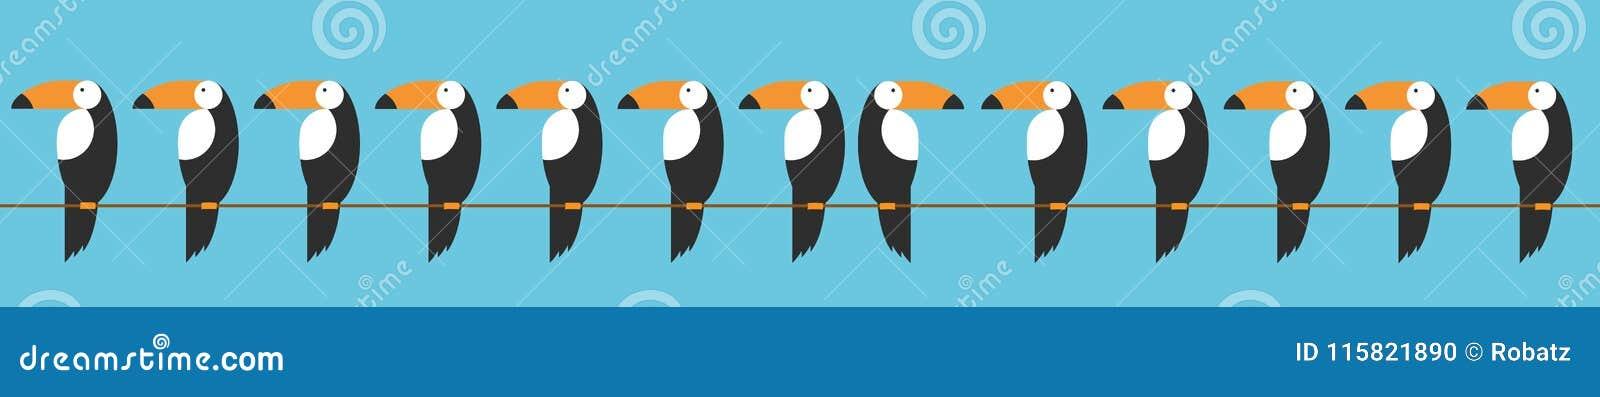 Toucans集合象 toucan传染媒介象的动画片例证网的 动物关于行为的变化的概念用一个讽刺方式